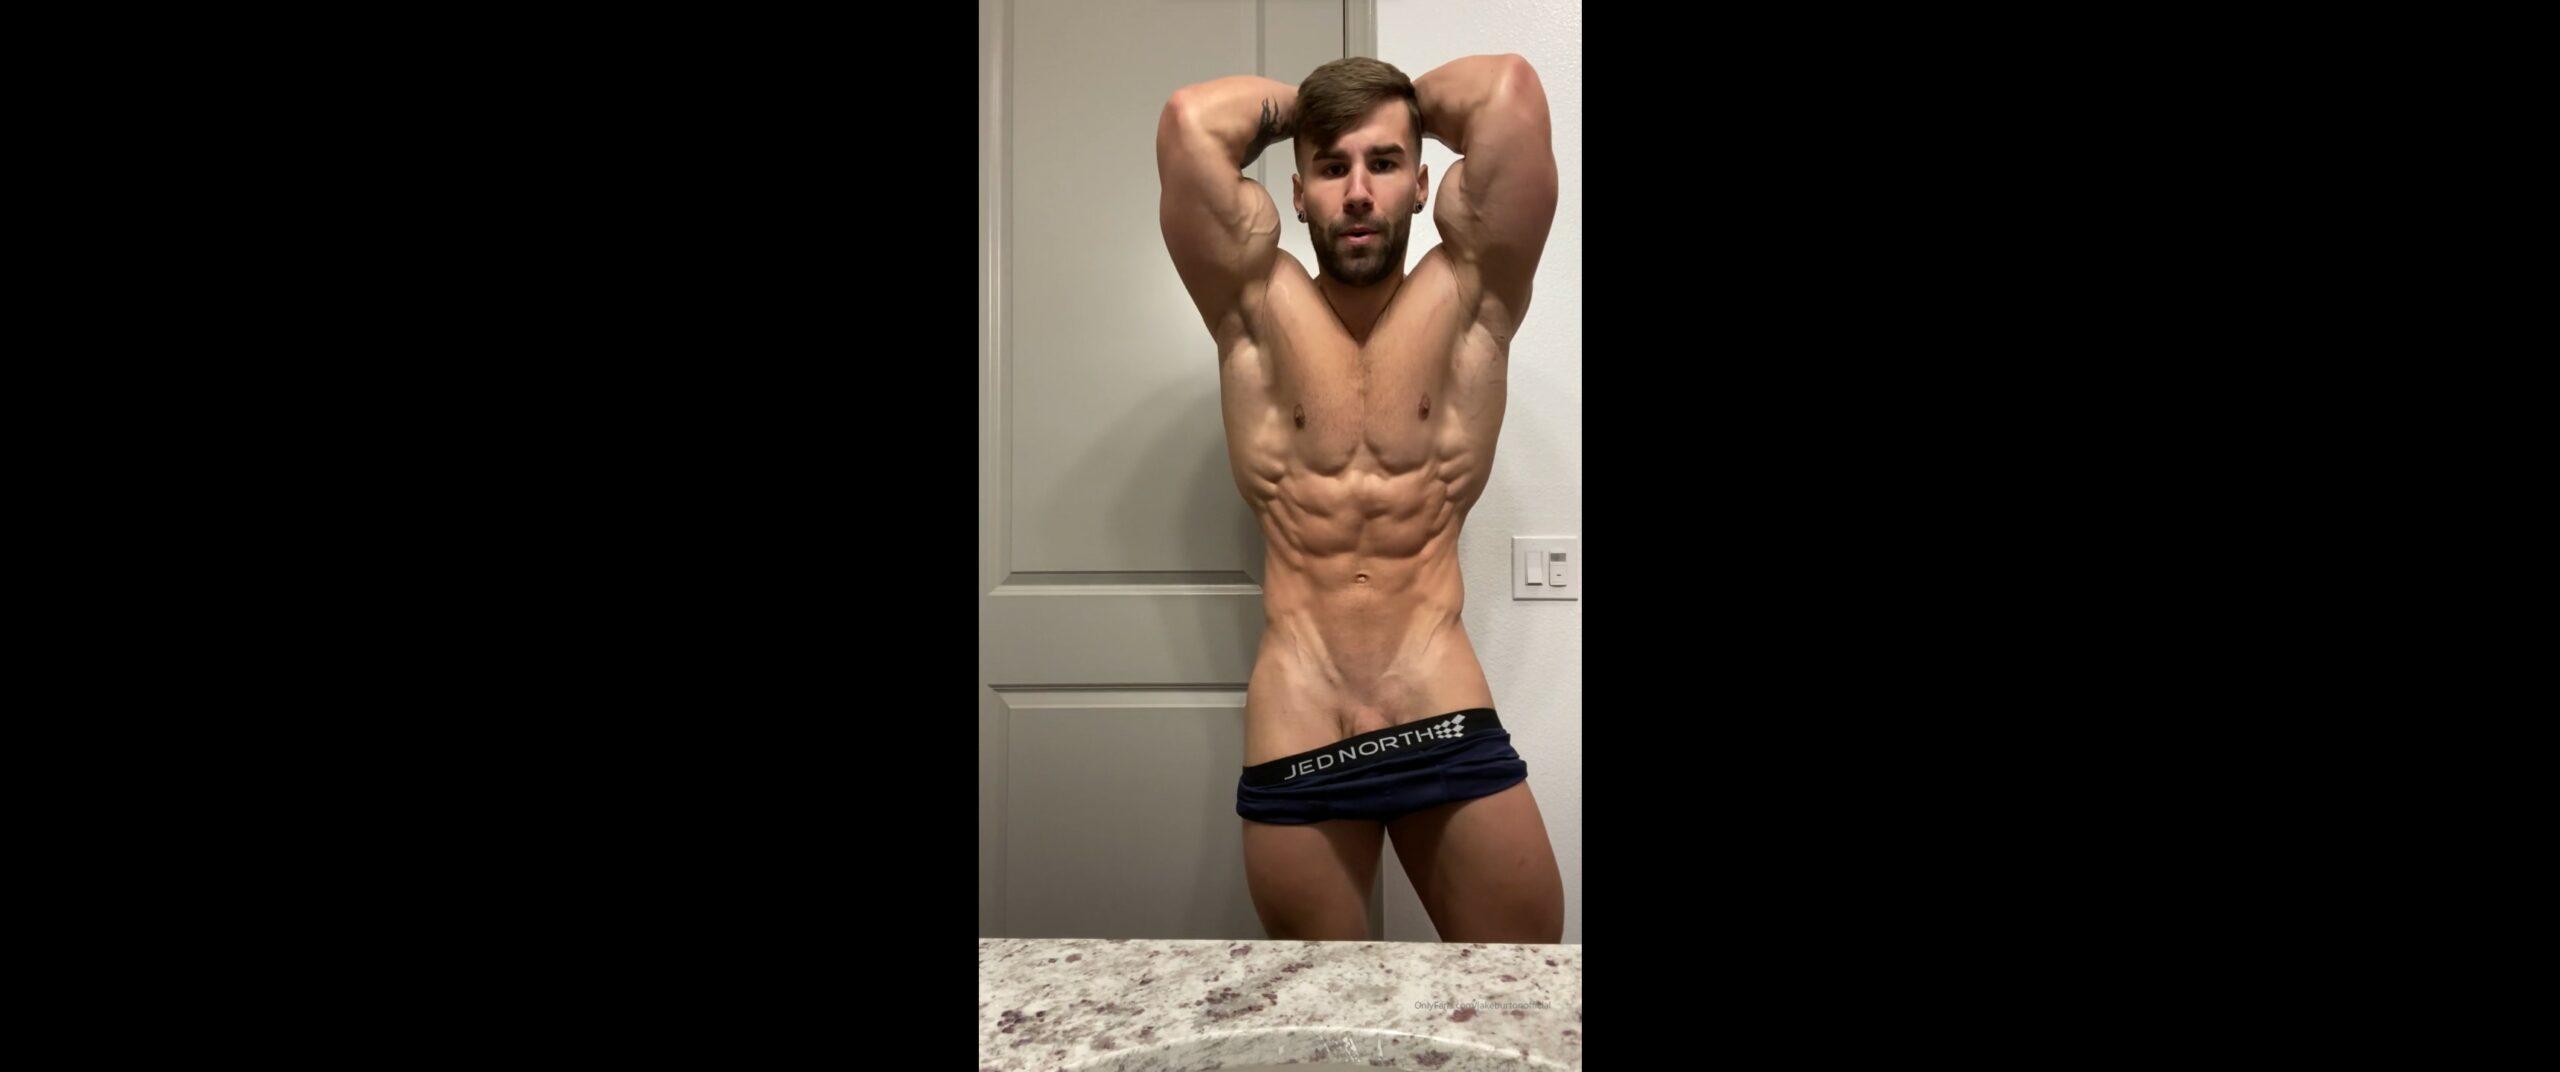 Flexing hard before my shower - Jake Burton (JakeBurtonOfficial)